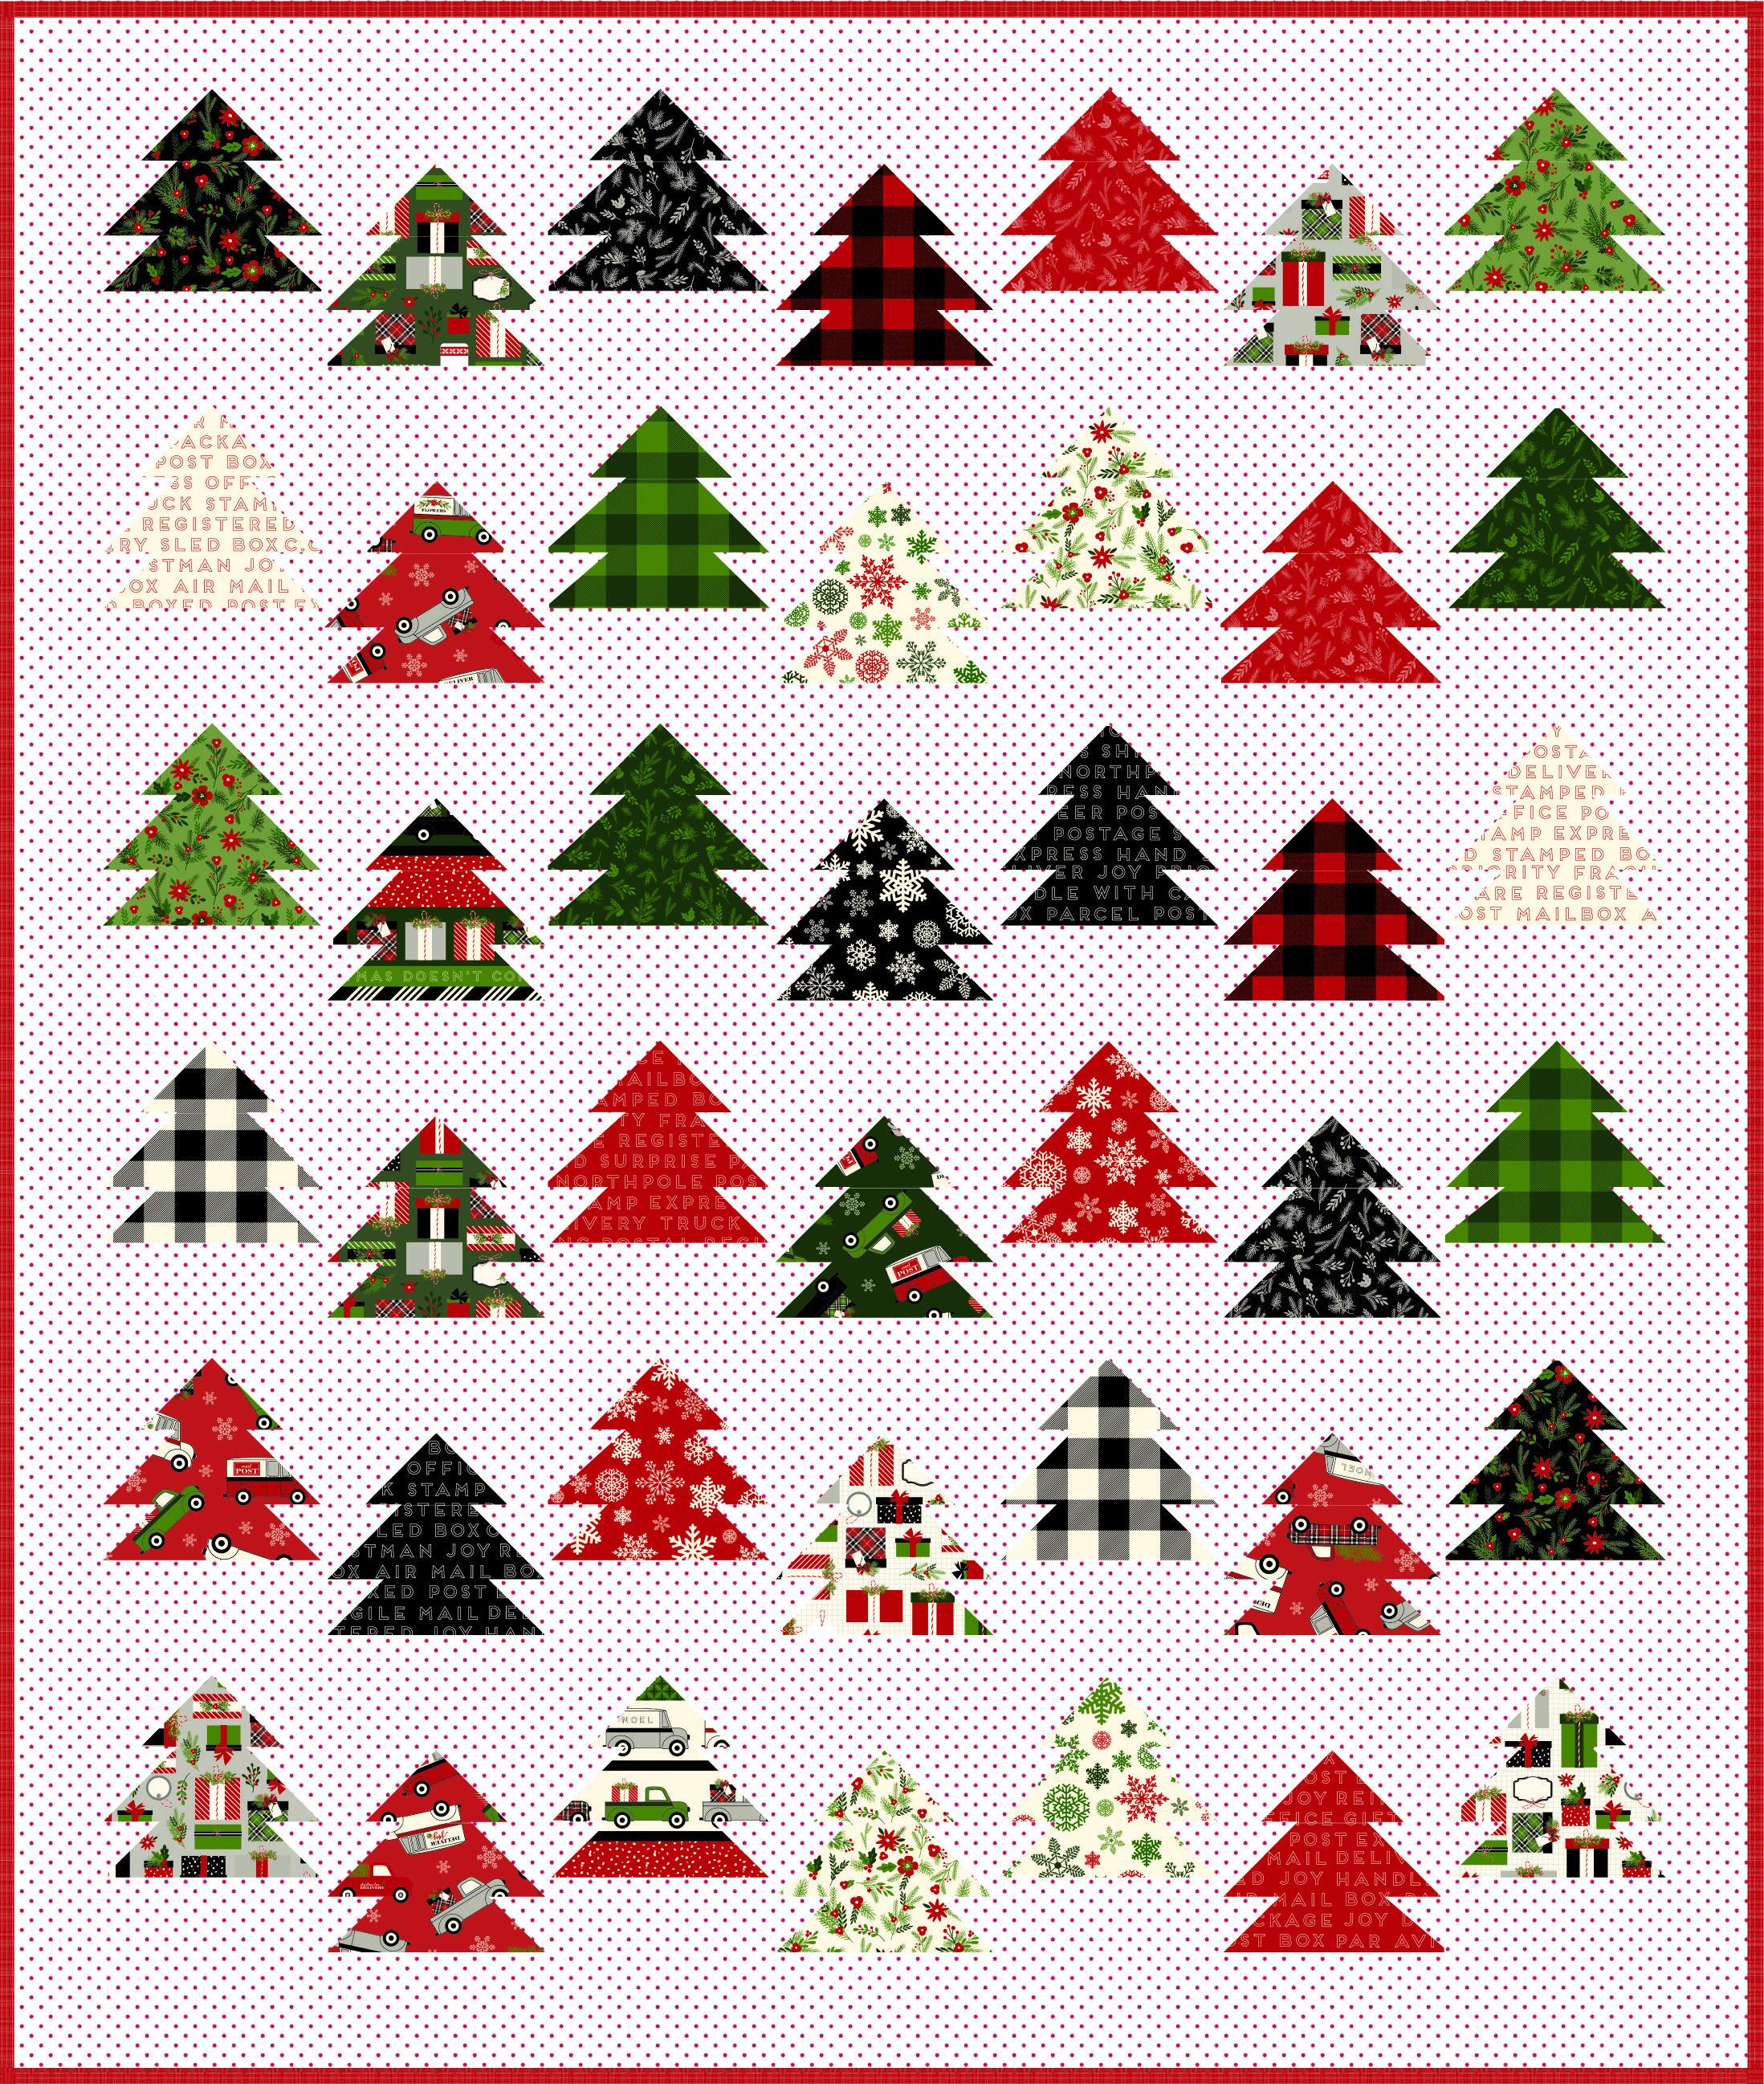 Keera Job - Tree Farm Quilt Pattern | Christmas Quilts | Pinterest ...